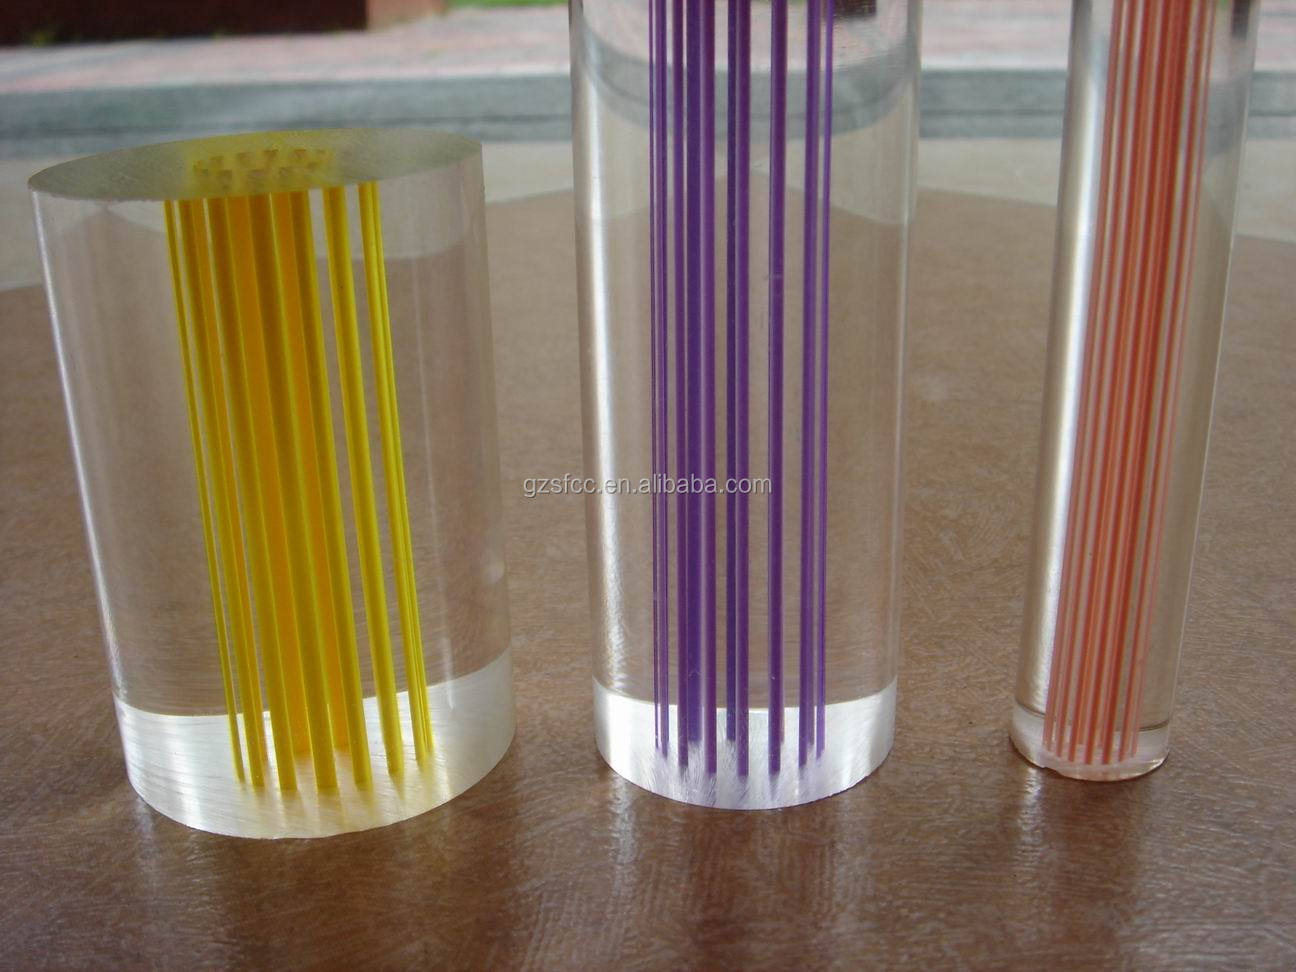 Acrylic curtain rod - Transparent Extruded Acrylic Rod Acrylic Curtain Rods